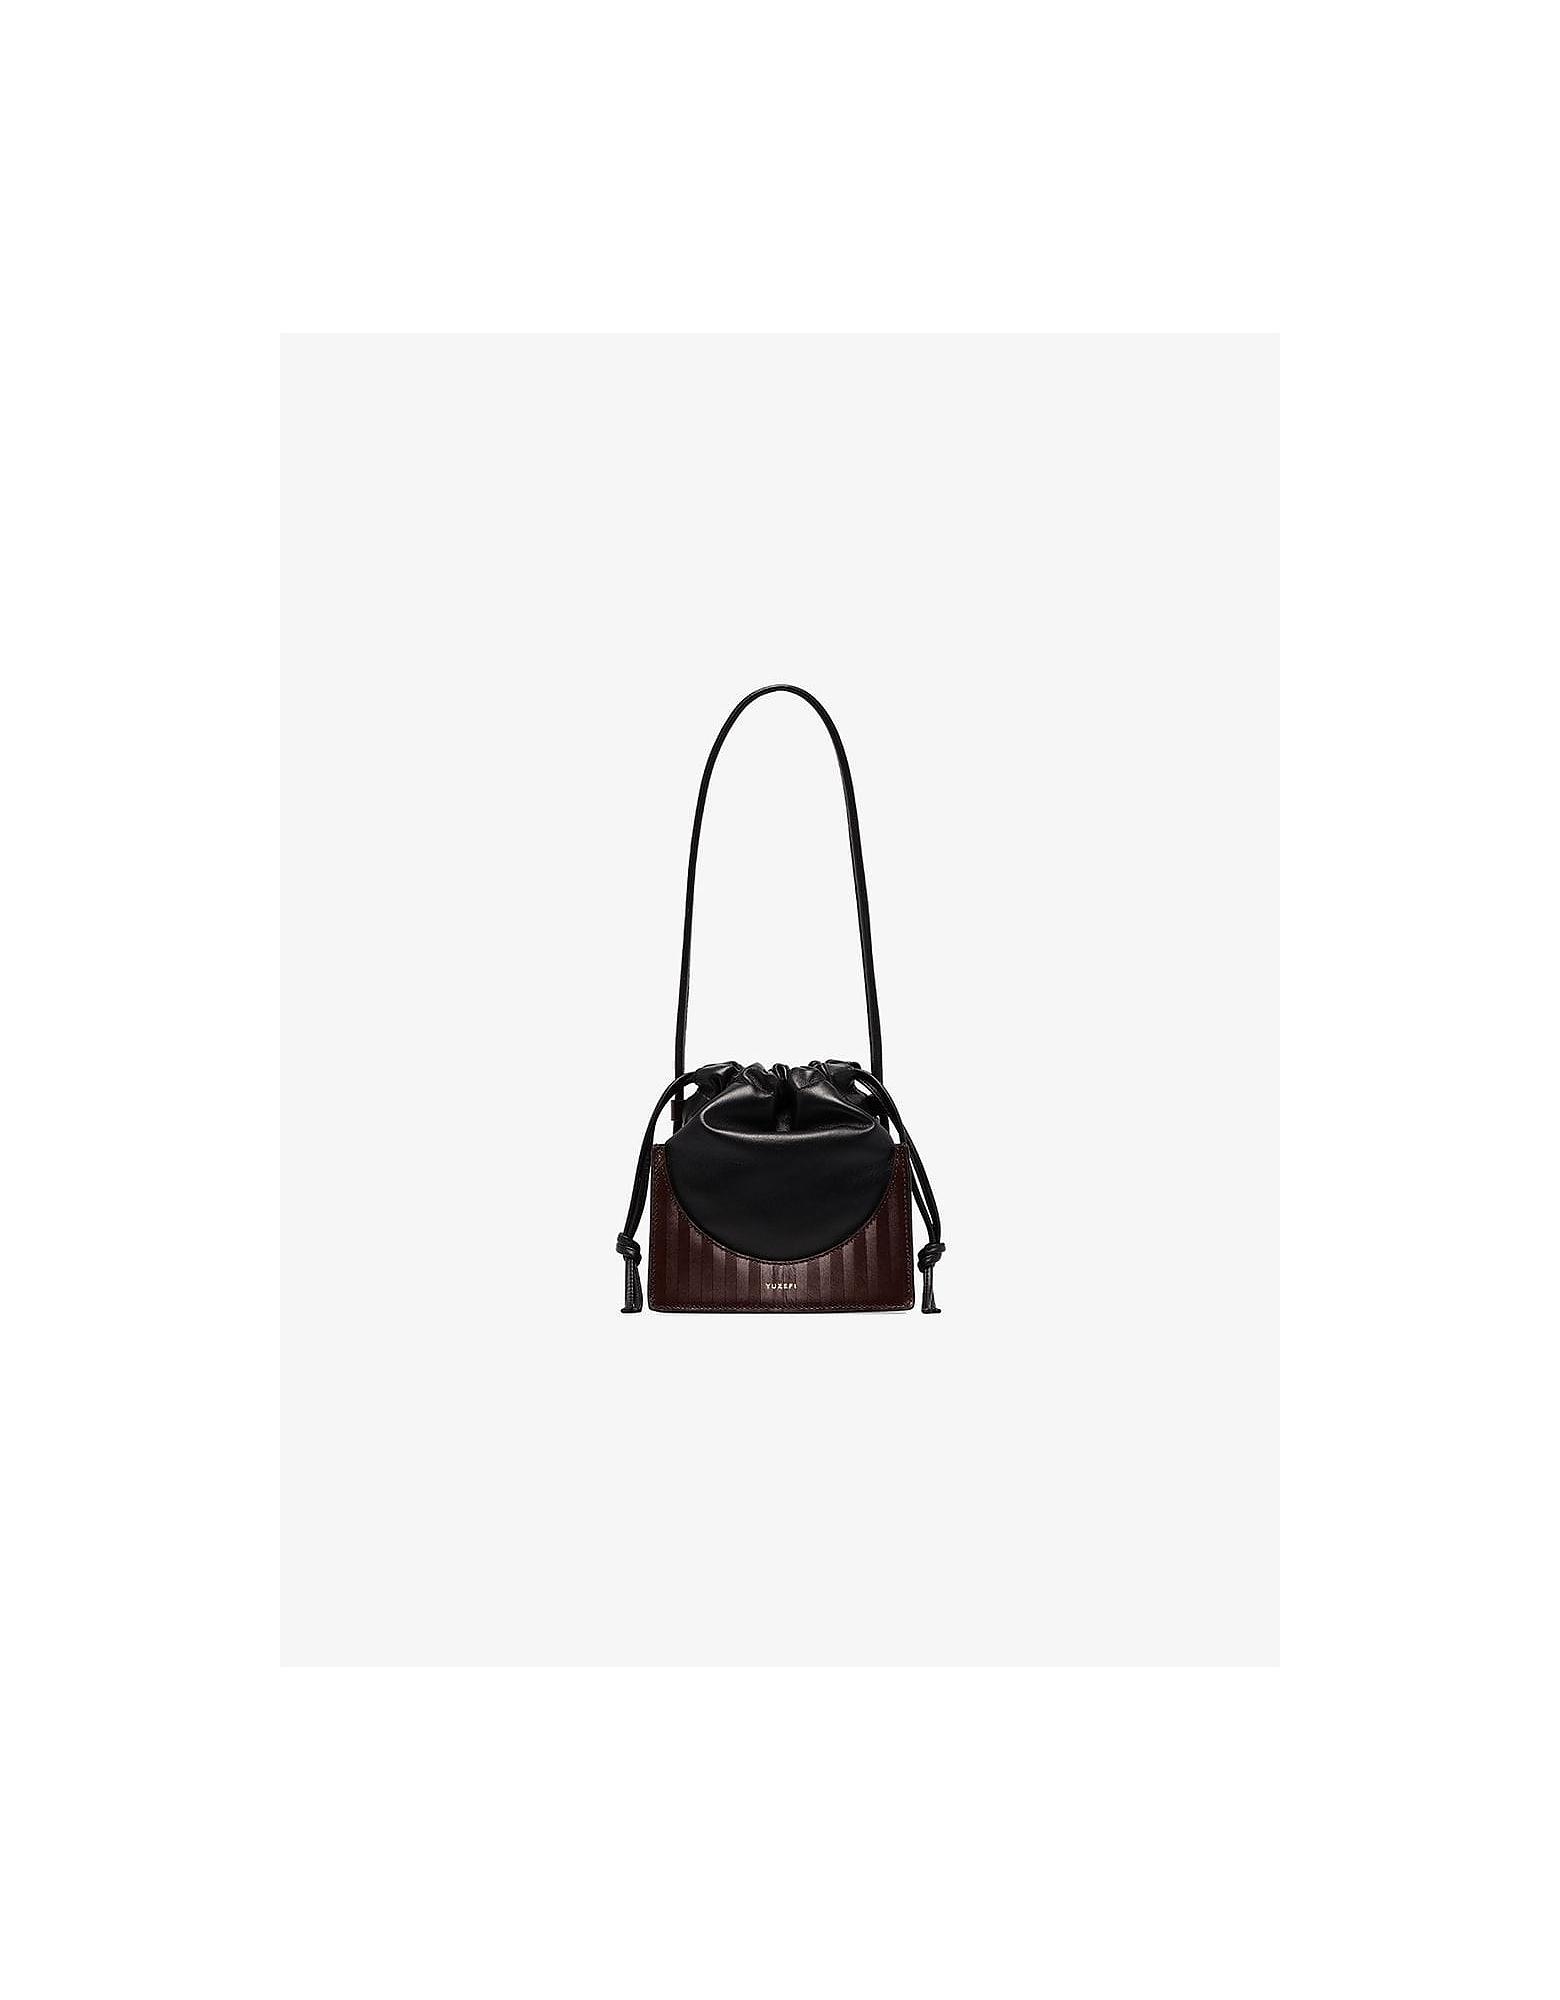 Yuzefi Designer Handbags, Black and Herringbone Pouchy Mini Bag